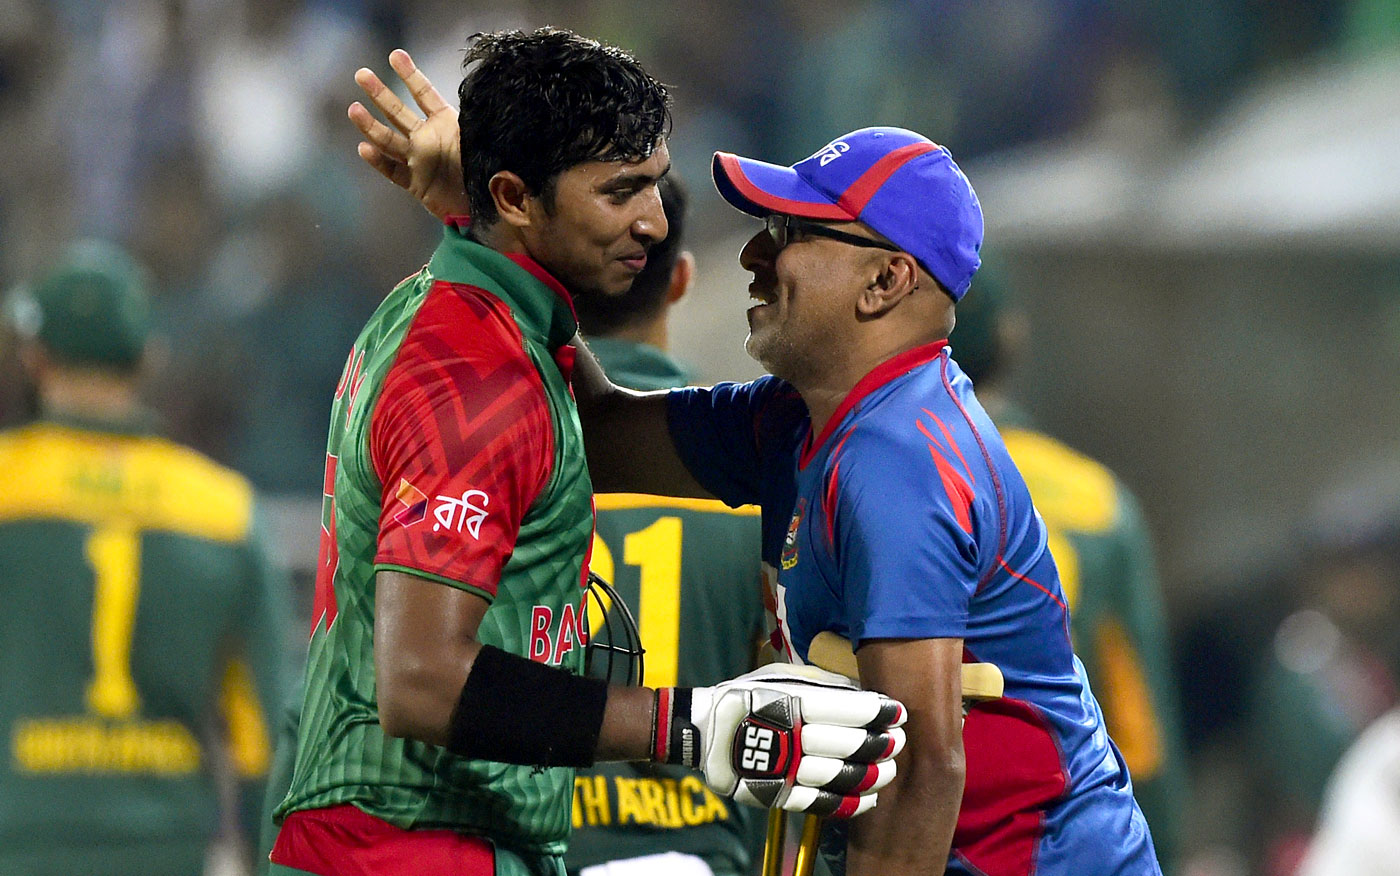 Sri Lanka wins toss, bats first in Bangladesh's 100th test